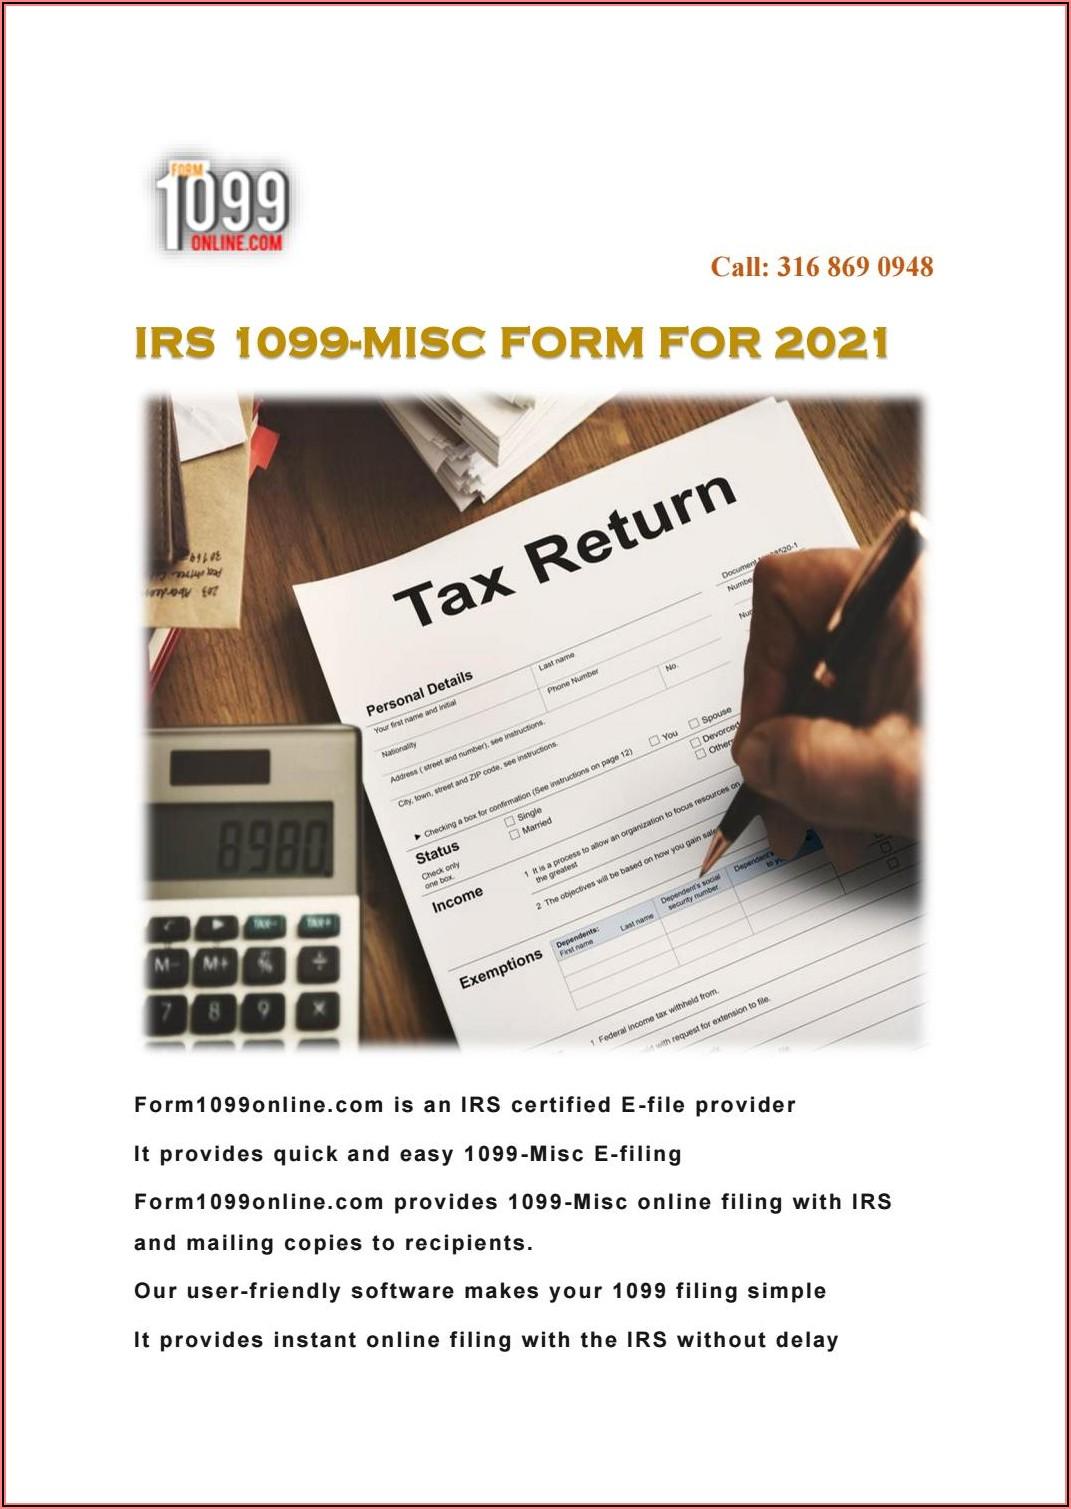 Can I File Form 1099 Misc Online